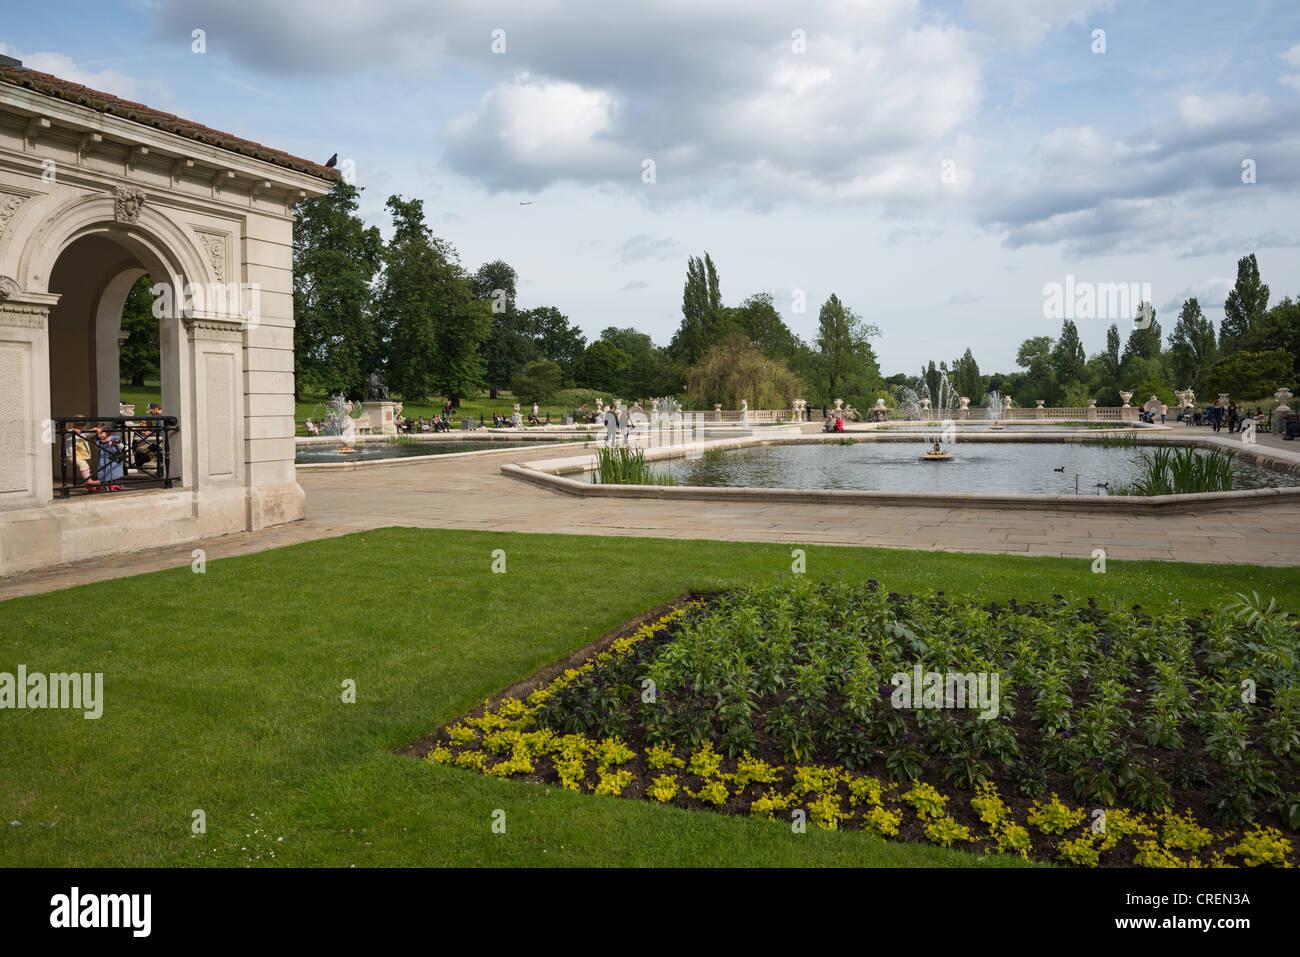 The Italian Gardens in Kensington Gardens, Lancaster Gate, London, England. - Stock Image